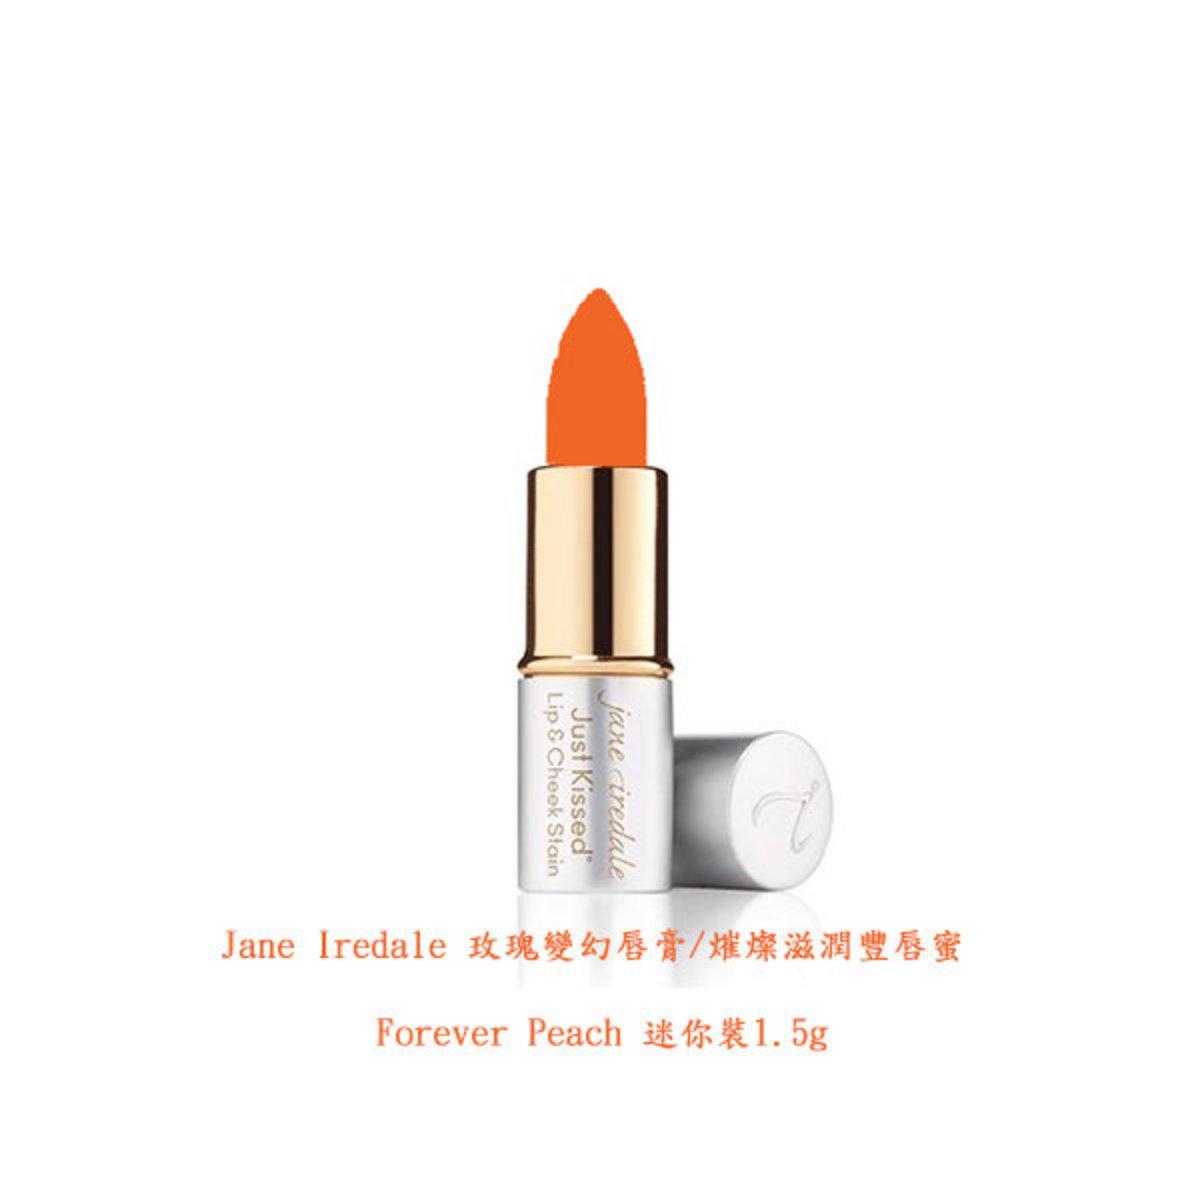 Jane Iredale 玫瑰變幻唇膏/熣燦滋潤豐唇蜜 - Forever Peach 迷你裝1.5g